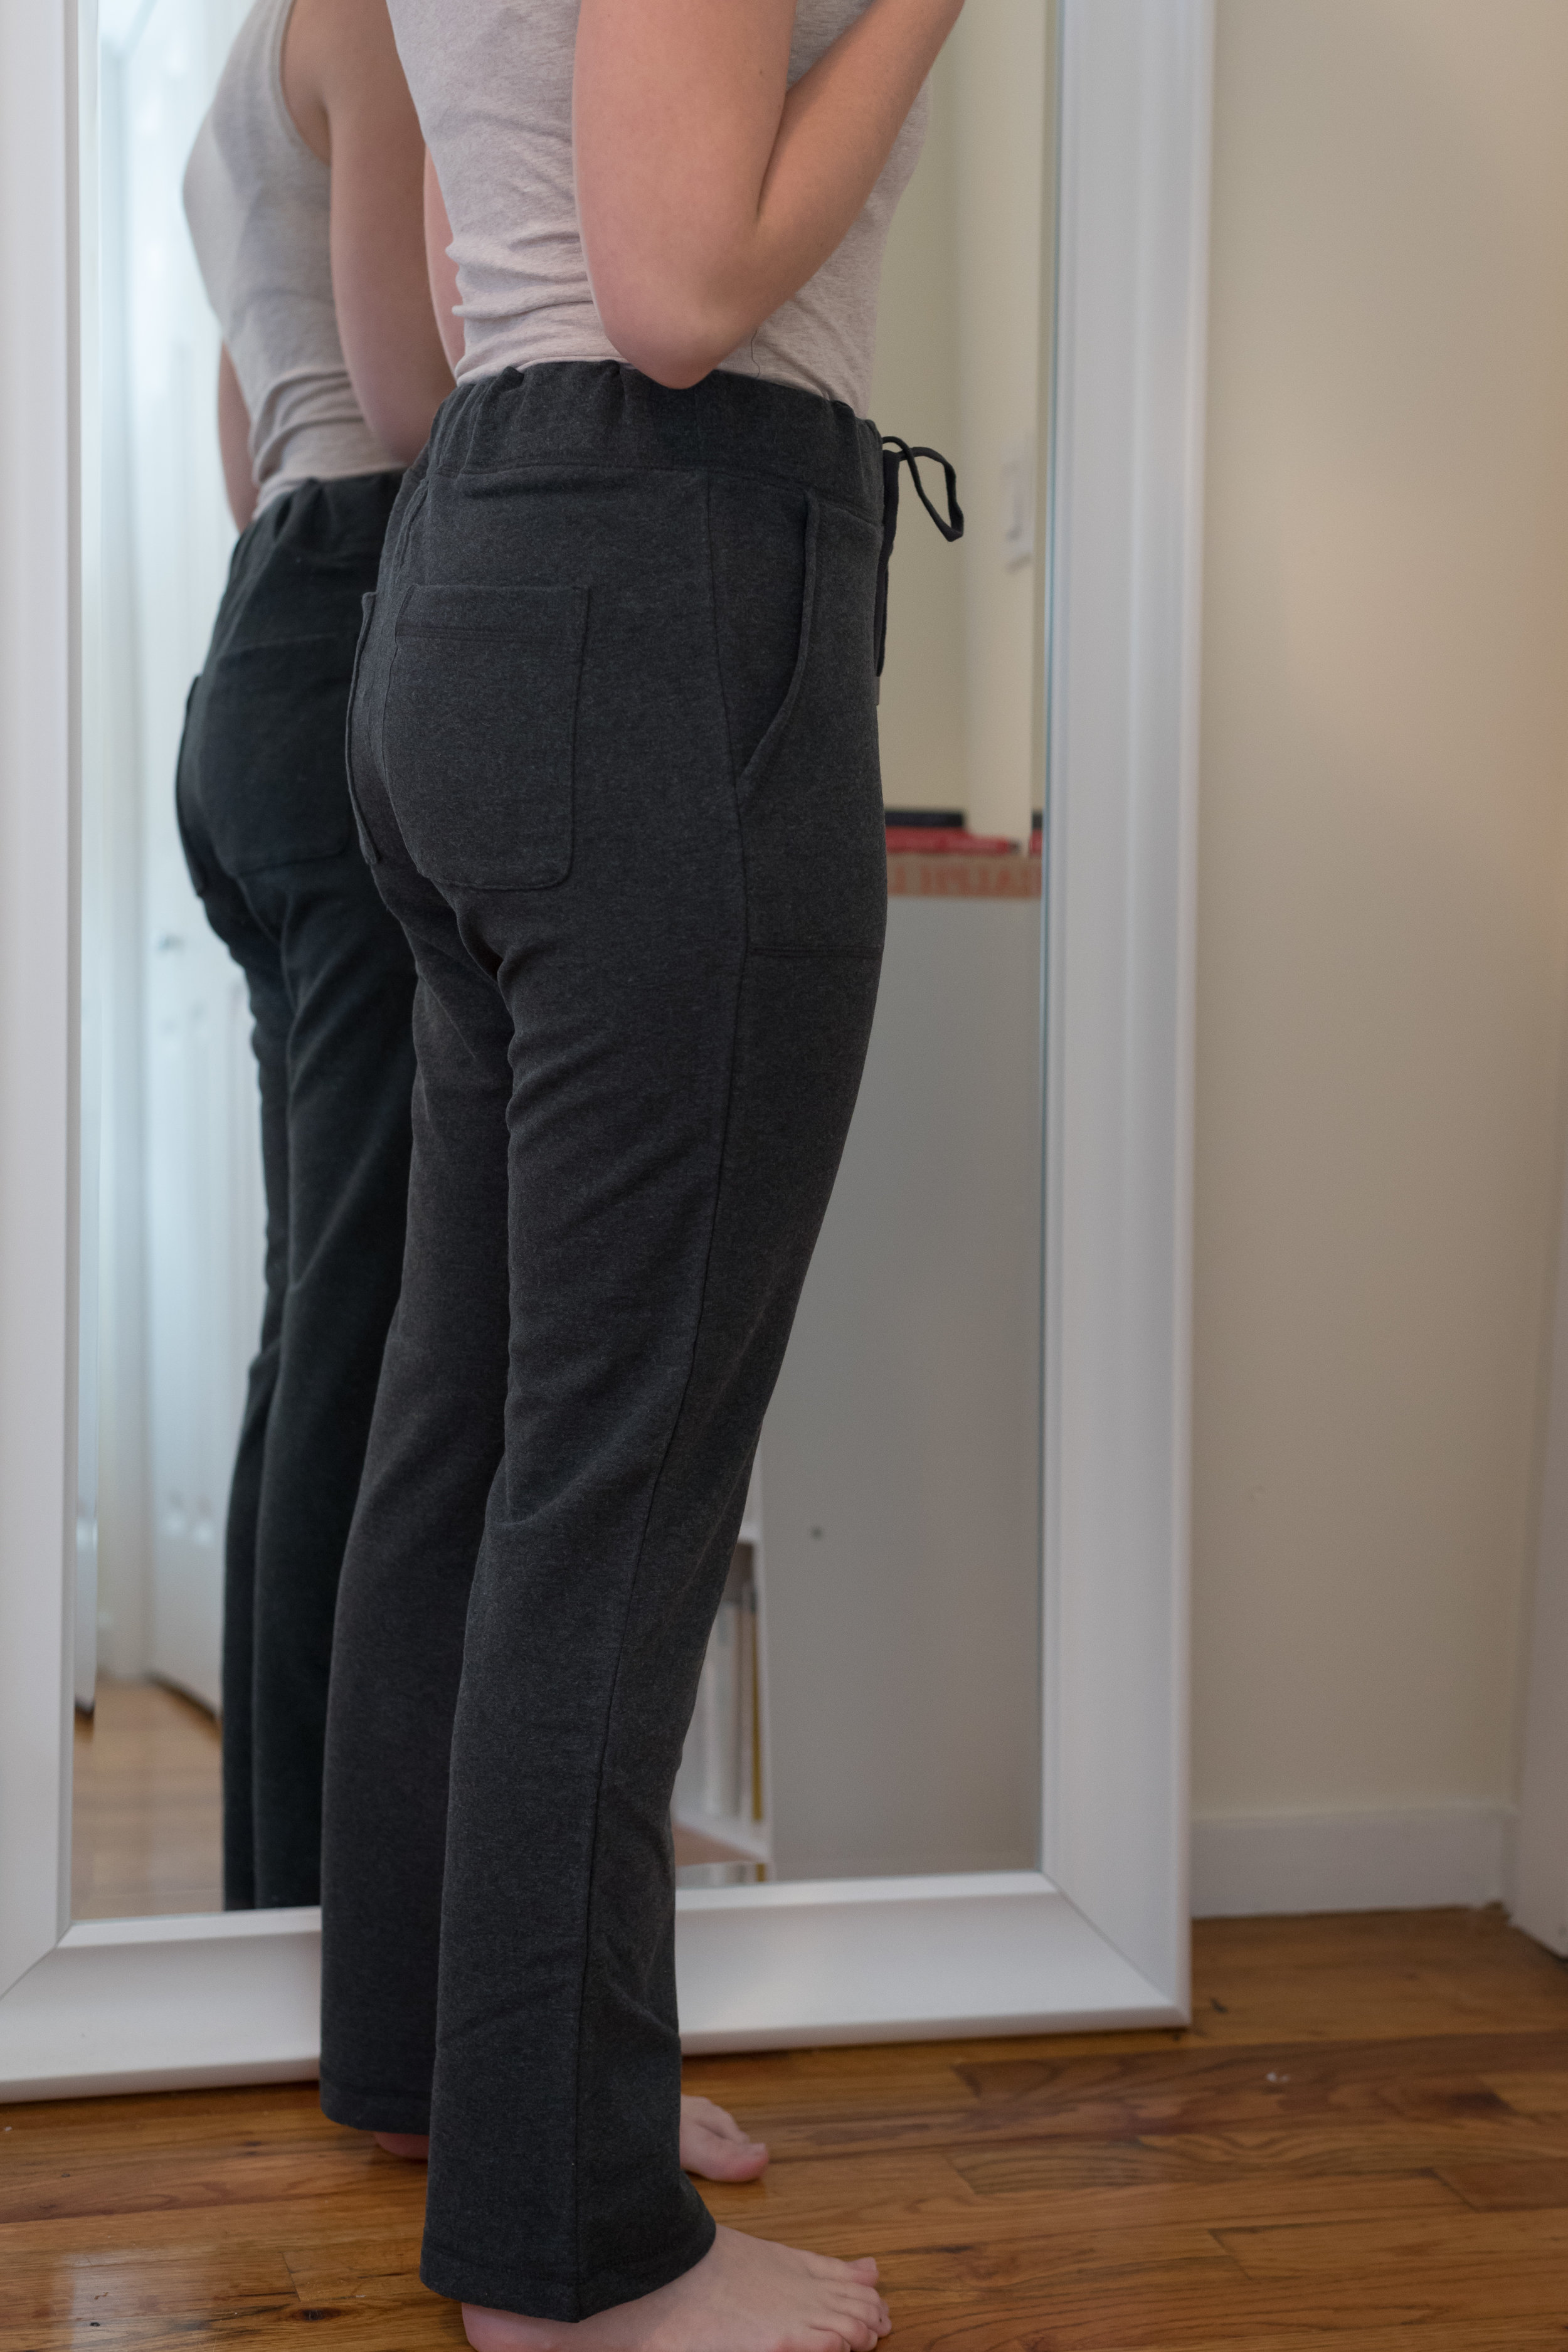 L.L. Bean Ultrasoft Sweats Straight Leg Petite - Size S Petite - Side View